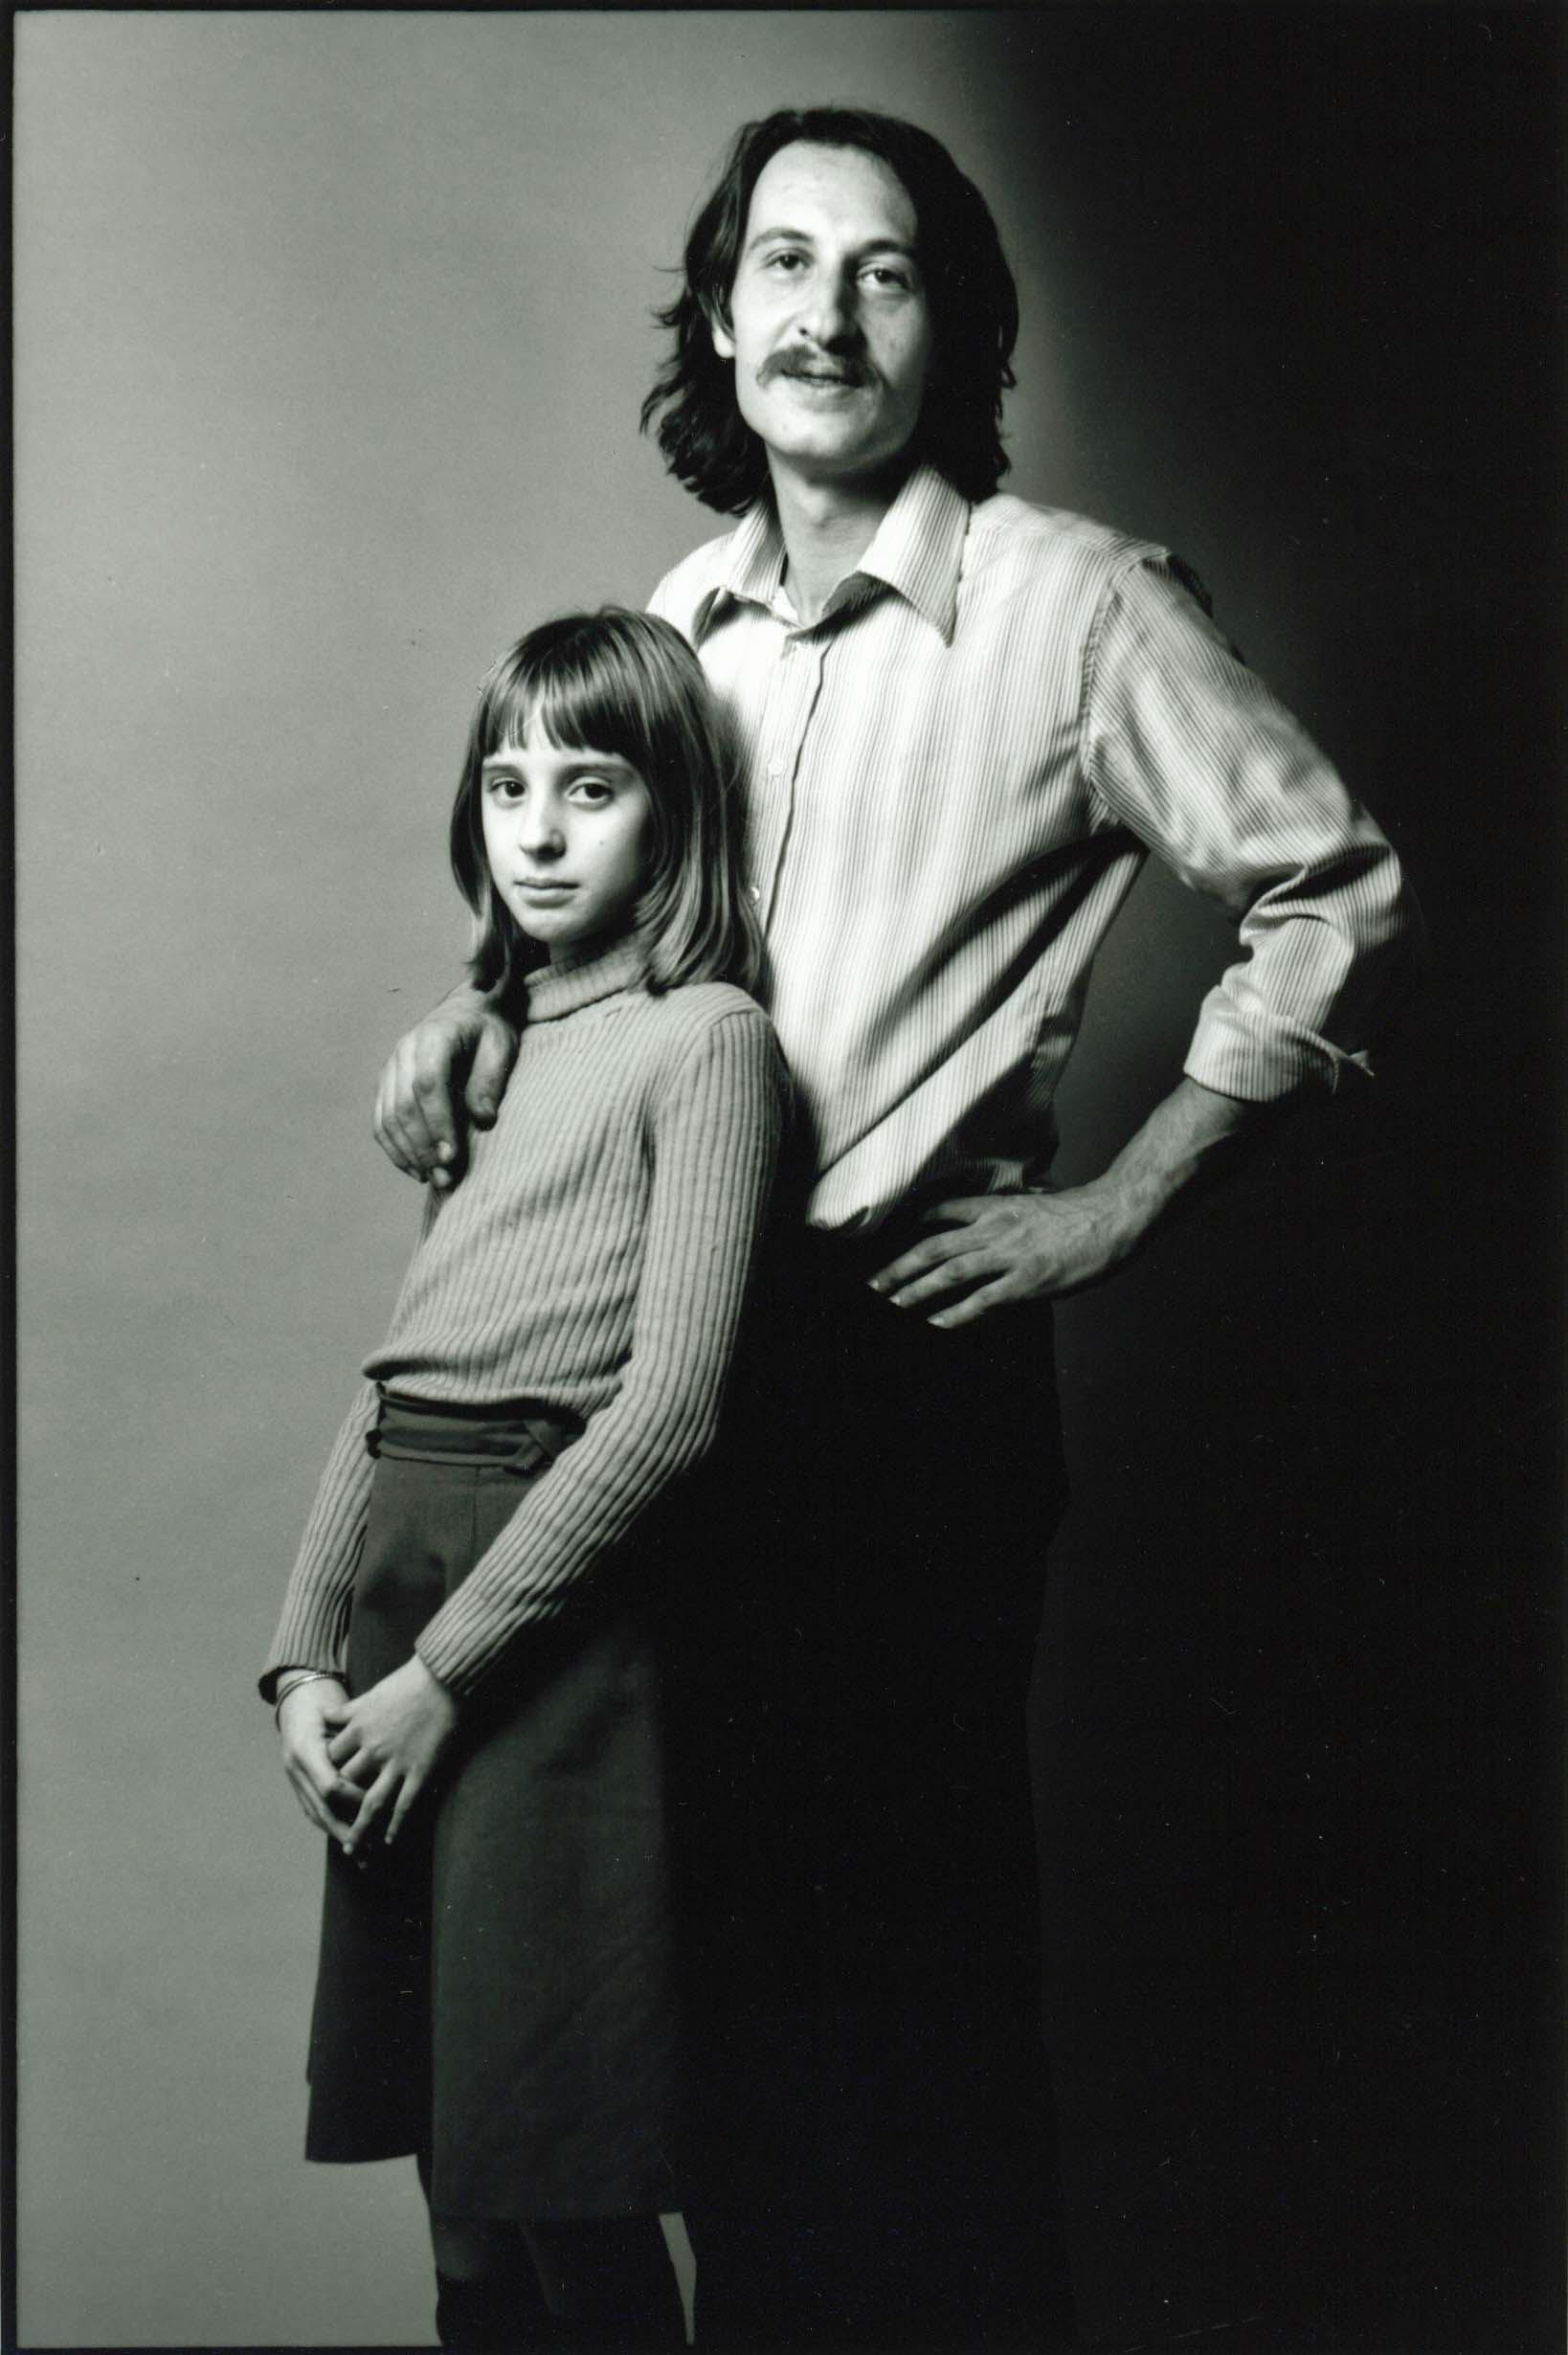 Enzo e Laudie - Foto Enzo Nocera - Milano 1975 - © Laudie Nocera